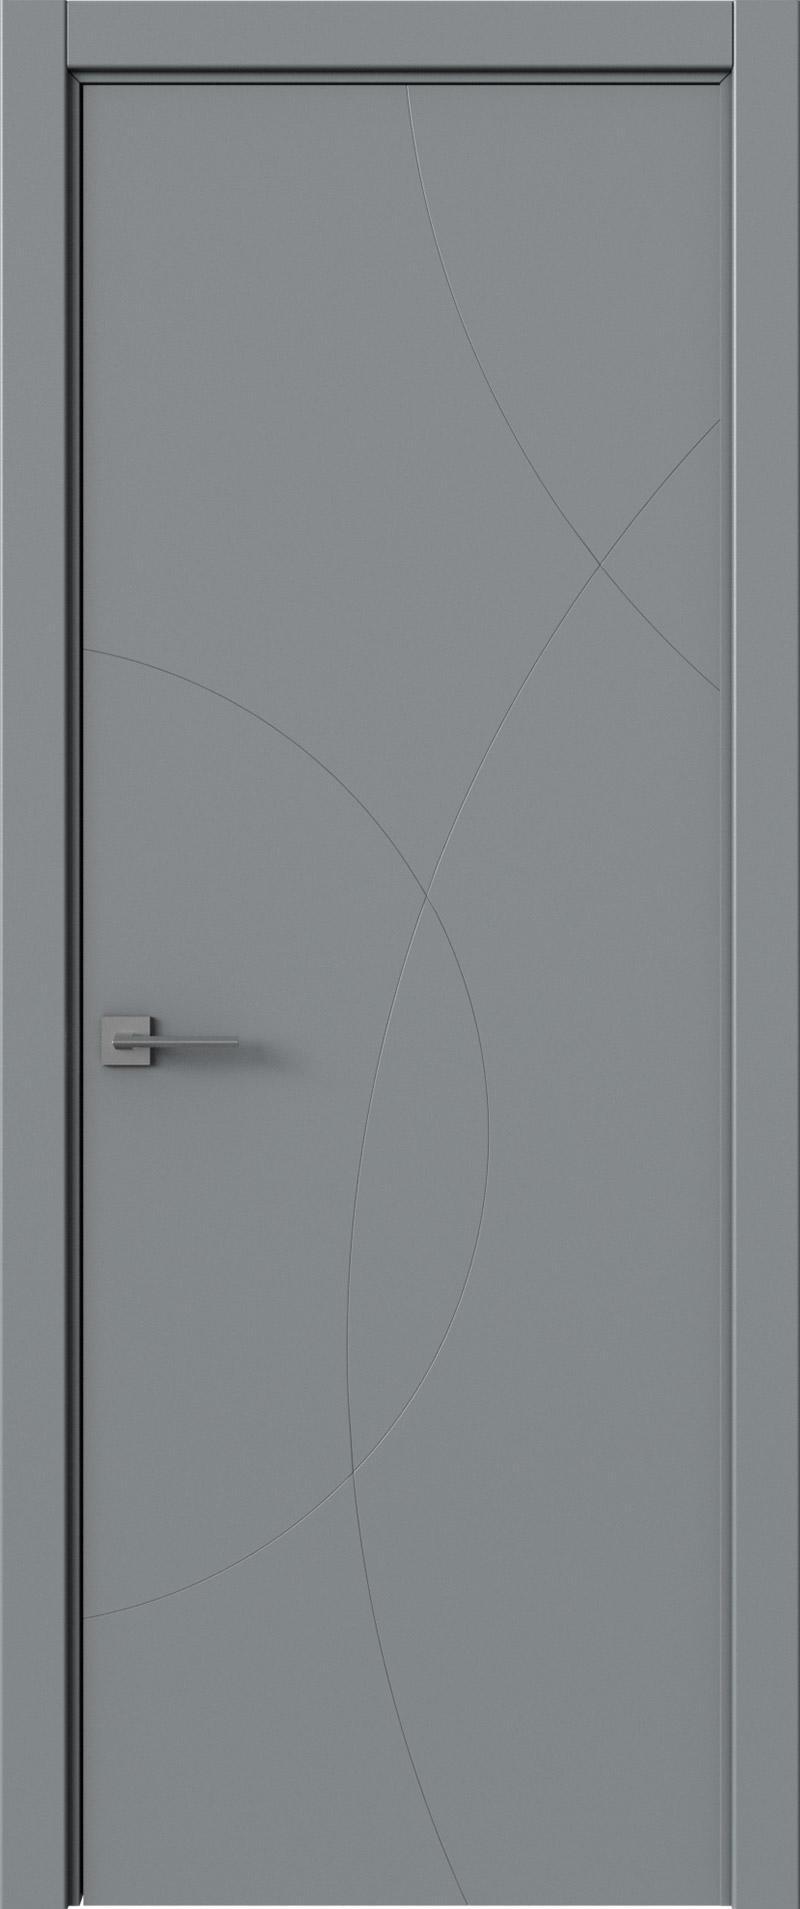 Tivoli Б-5 цвет - Серебристо-серая эмаль (RAL 7045) Без стекла (ДГ)